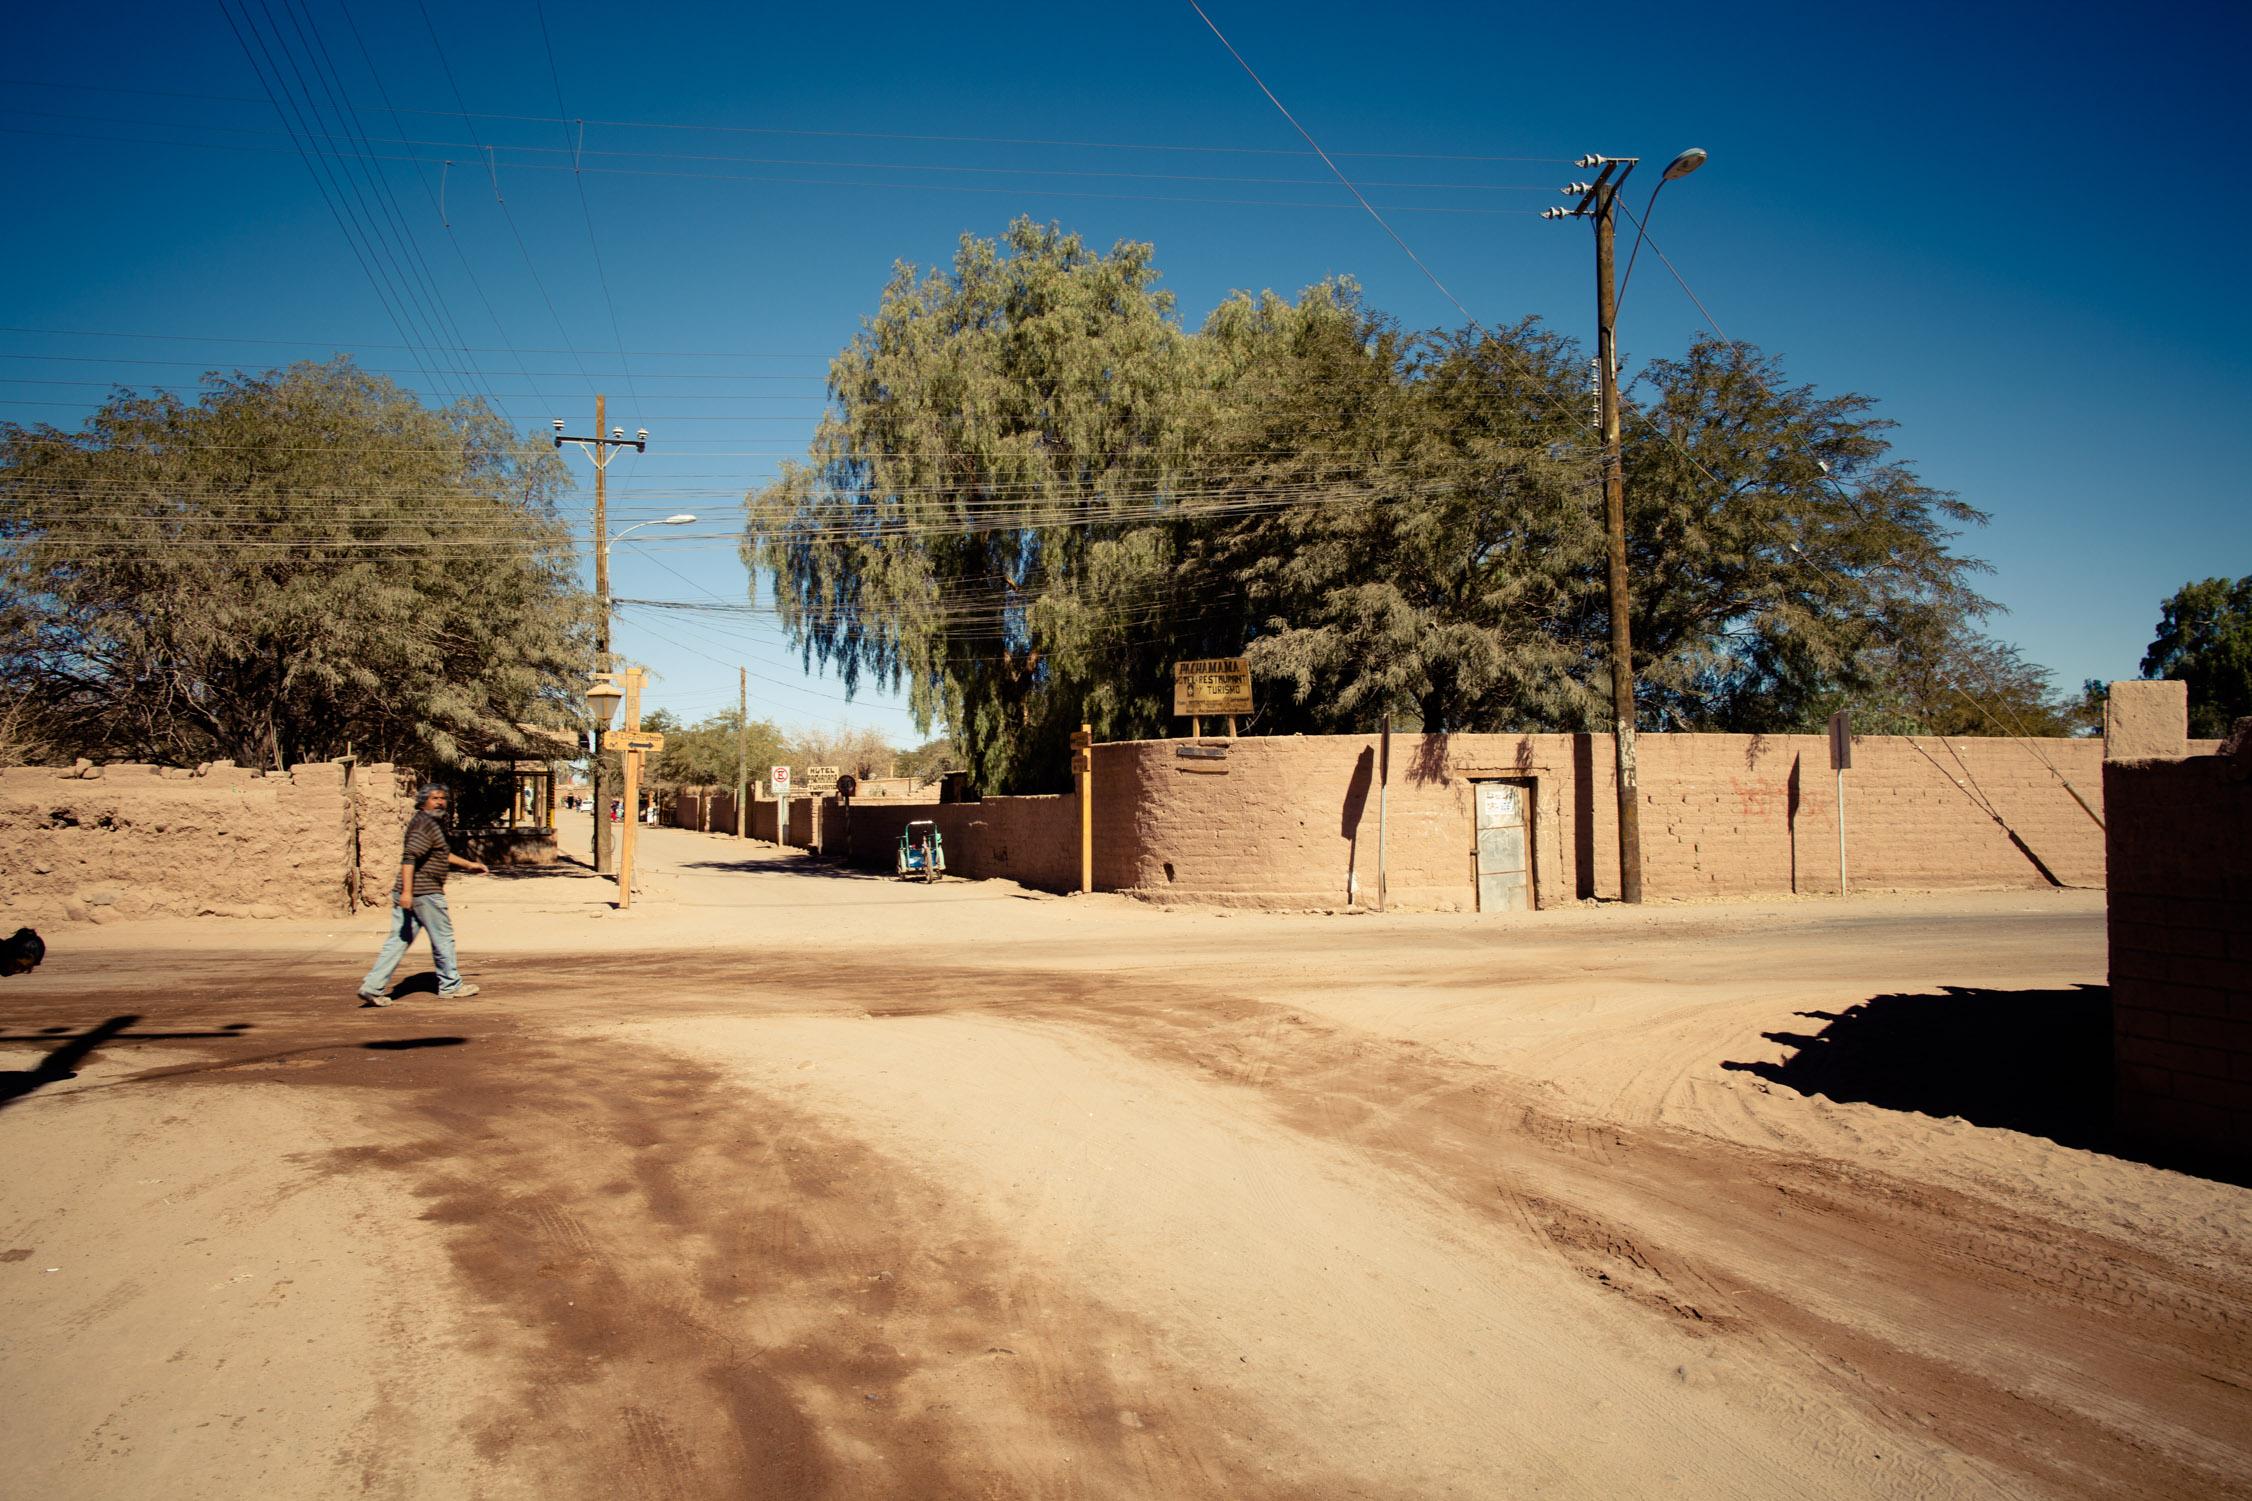 travel journals heading south peru bolivia chile episode pedro atacama back arequipa lima journey